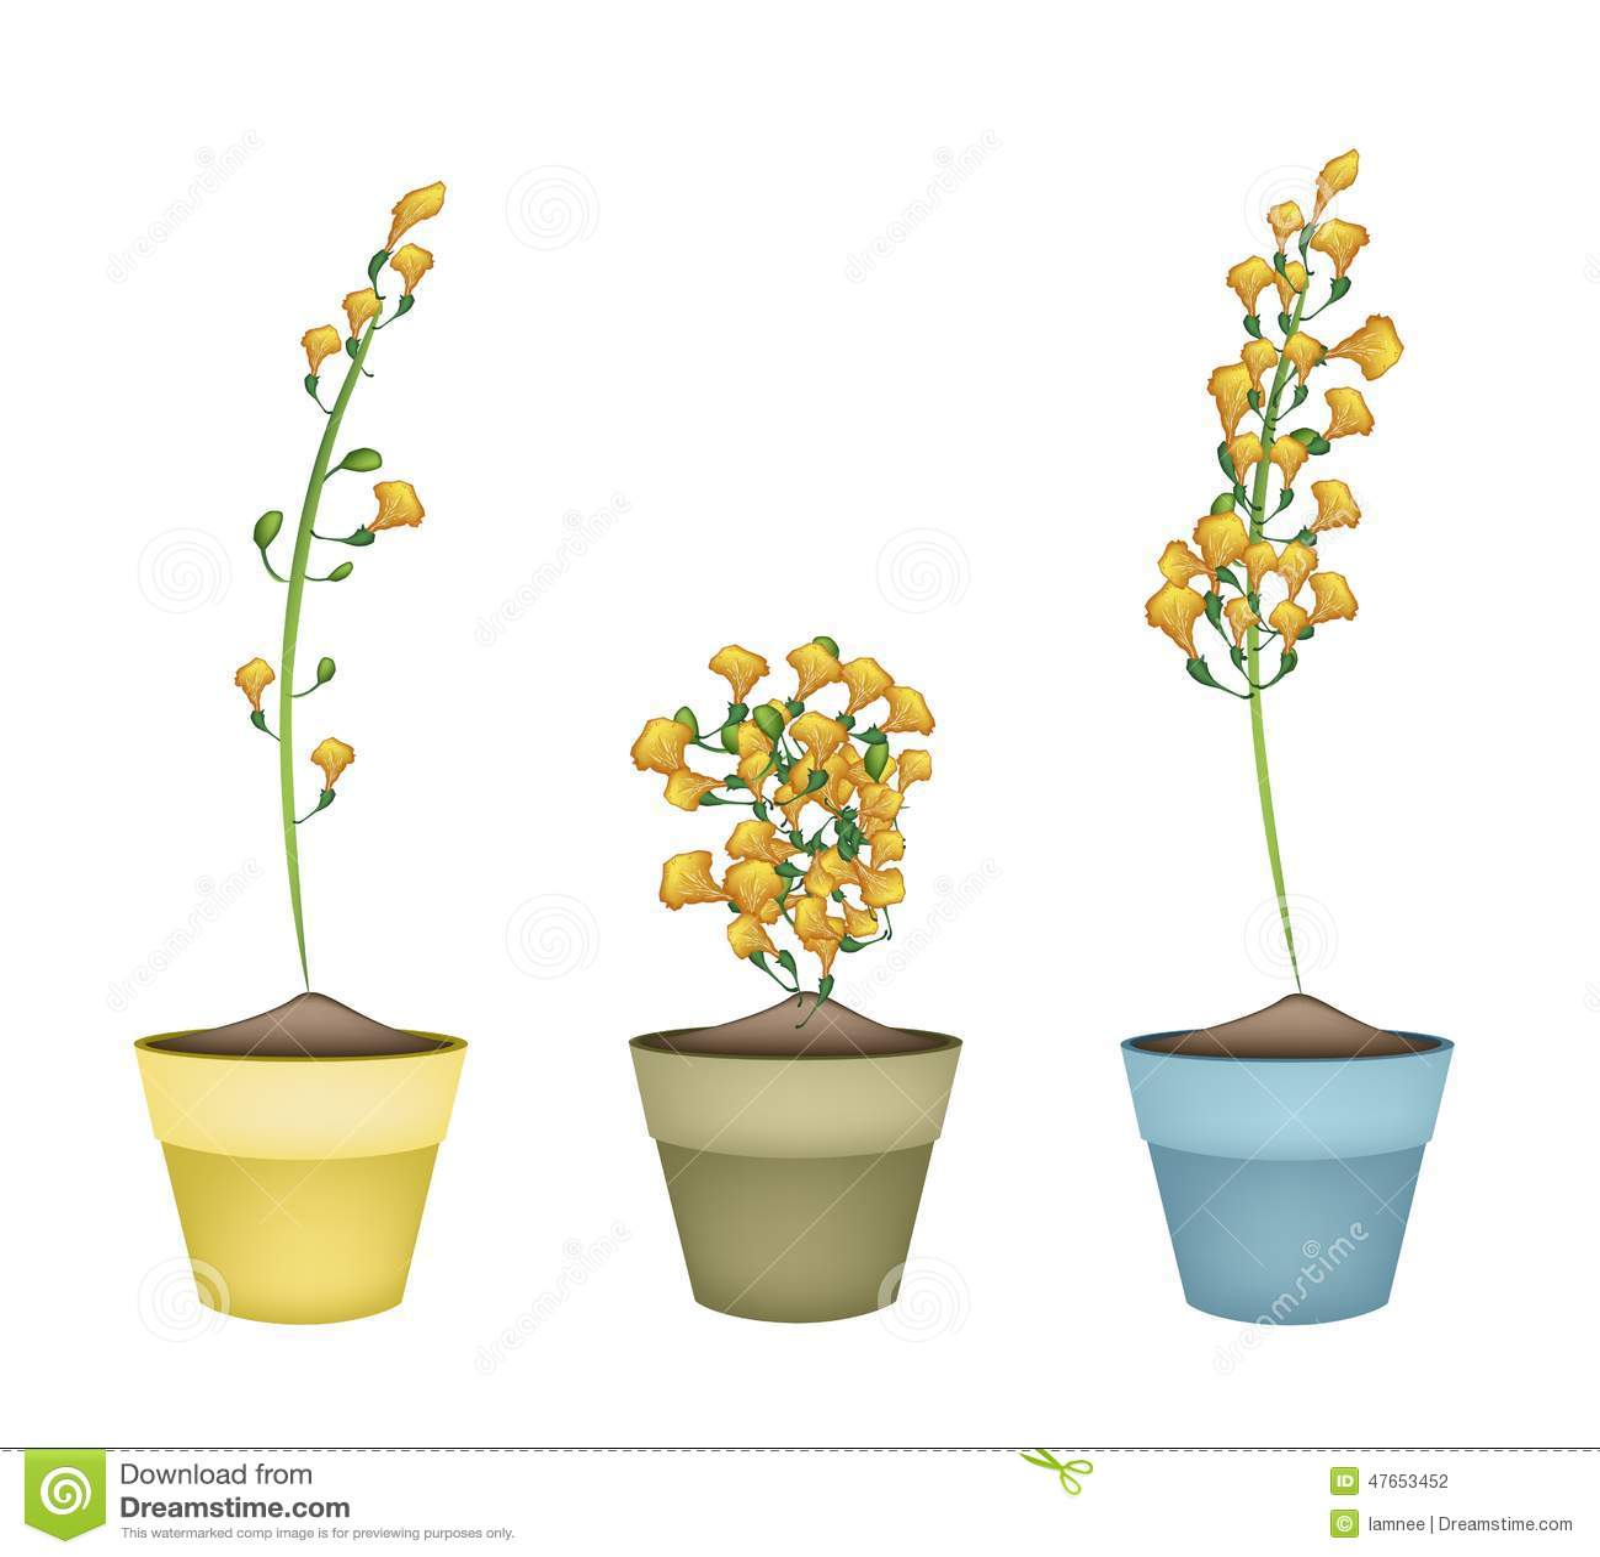 Yellow Padauk Flower In Ceramic Flower Pots Illustration 47653452